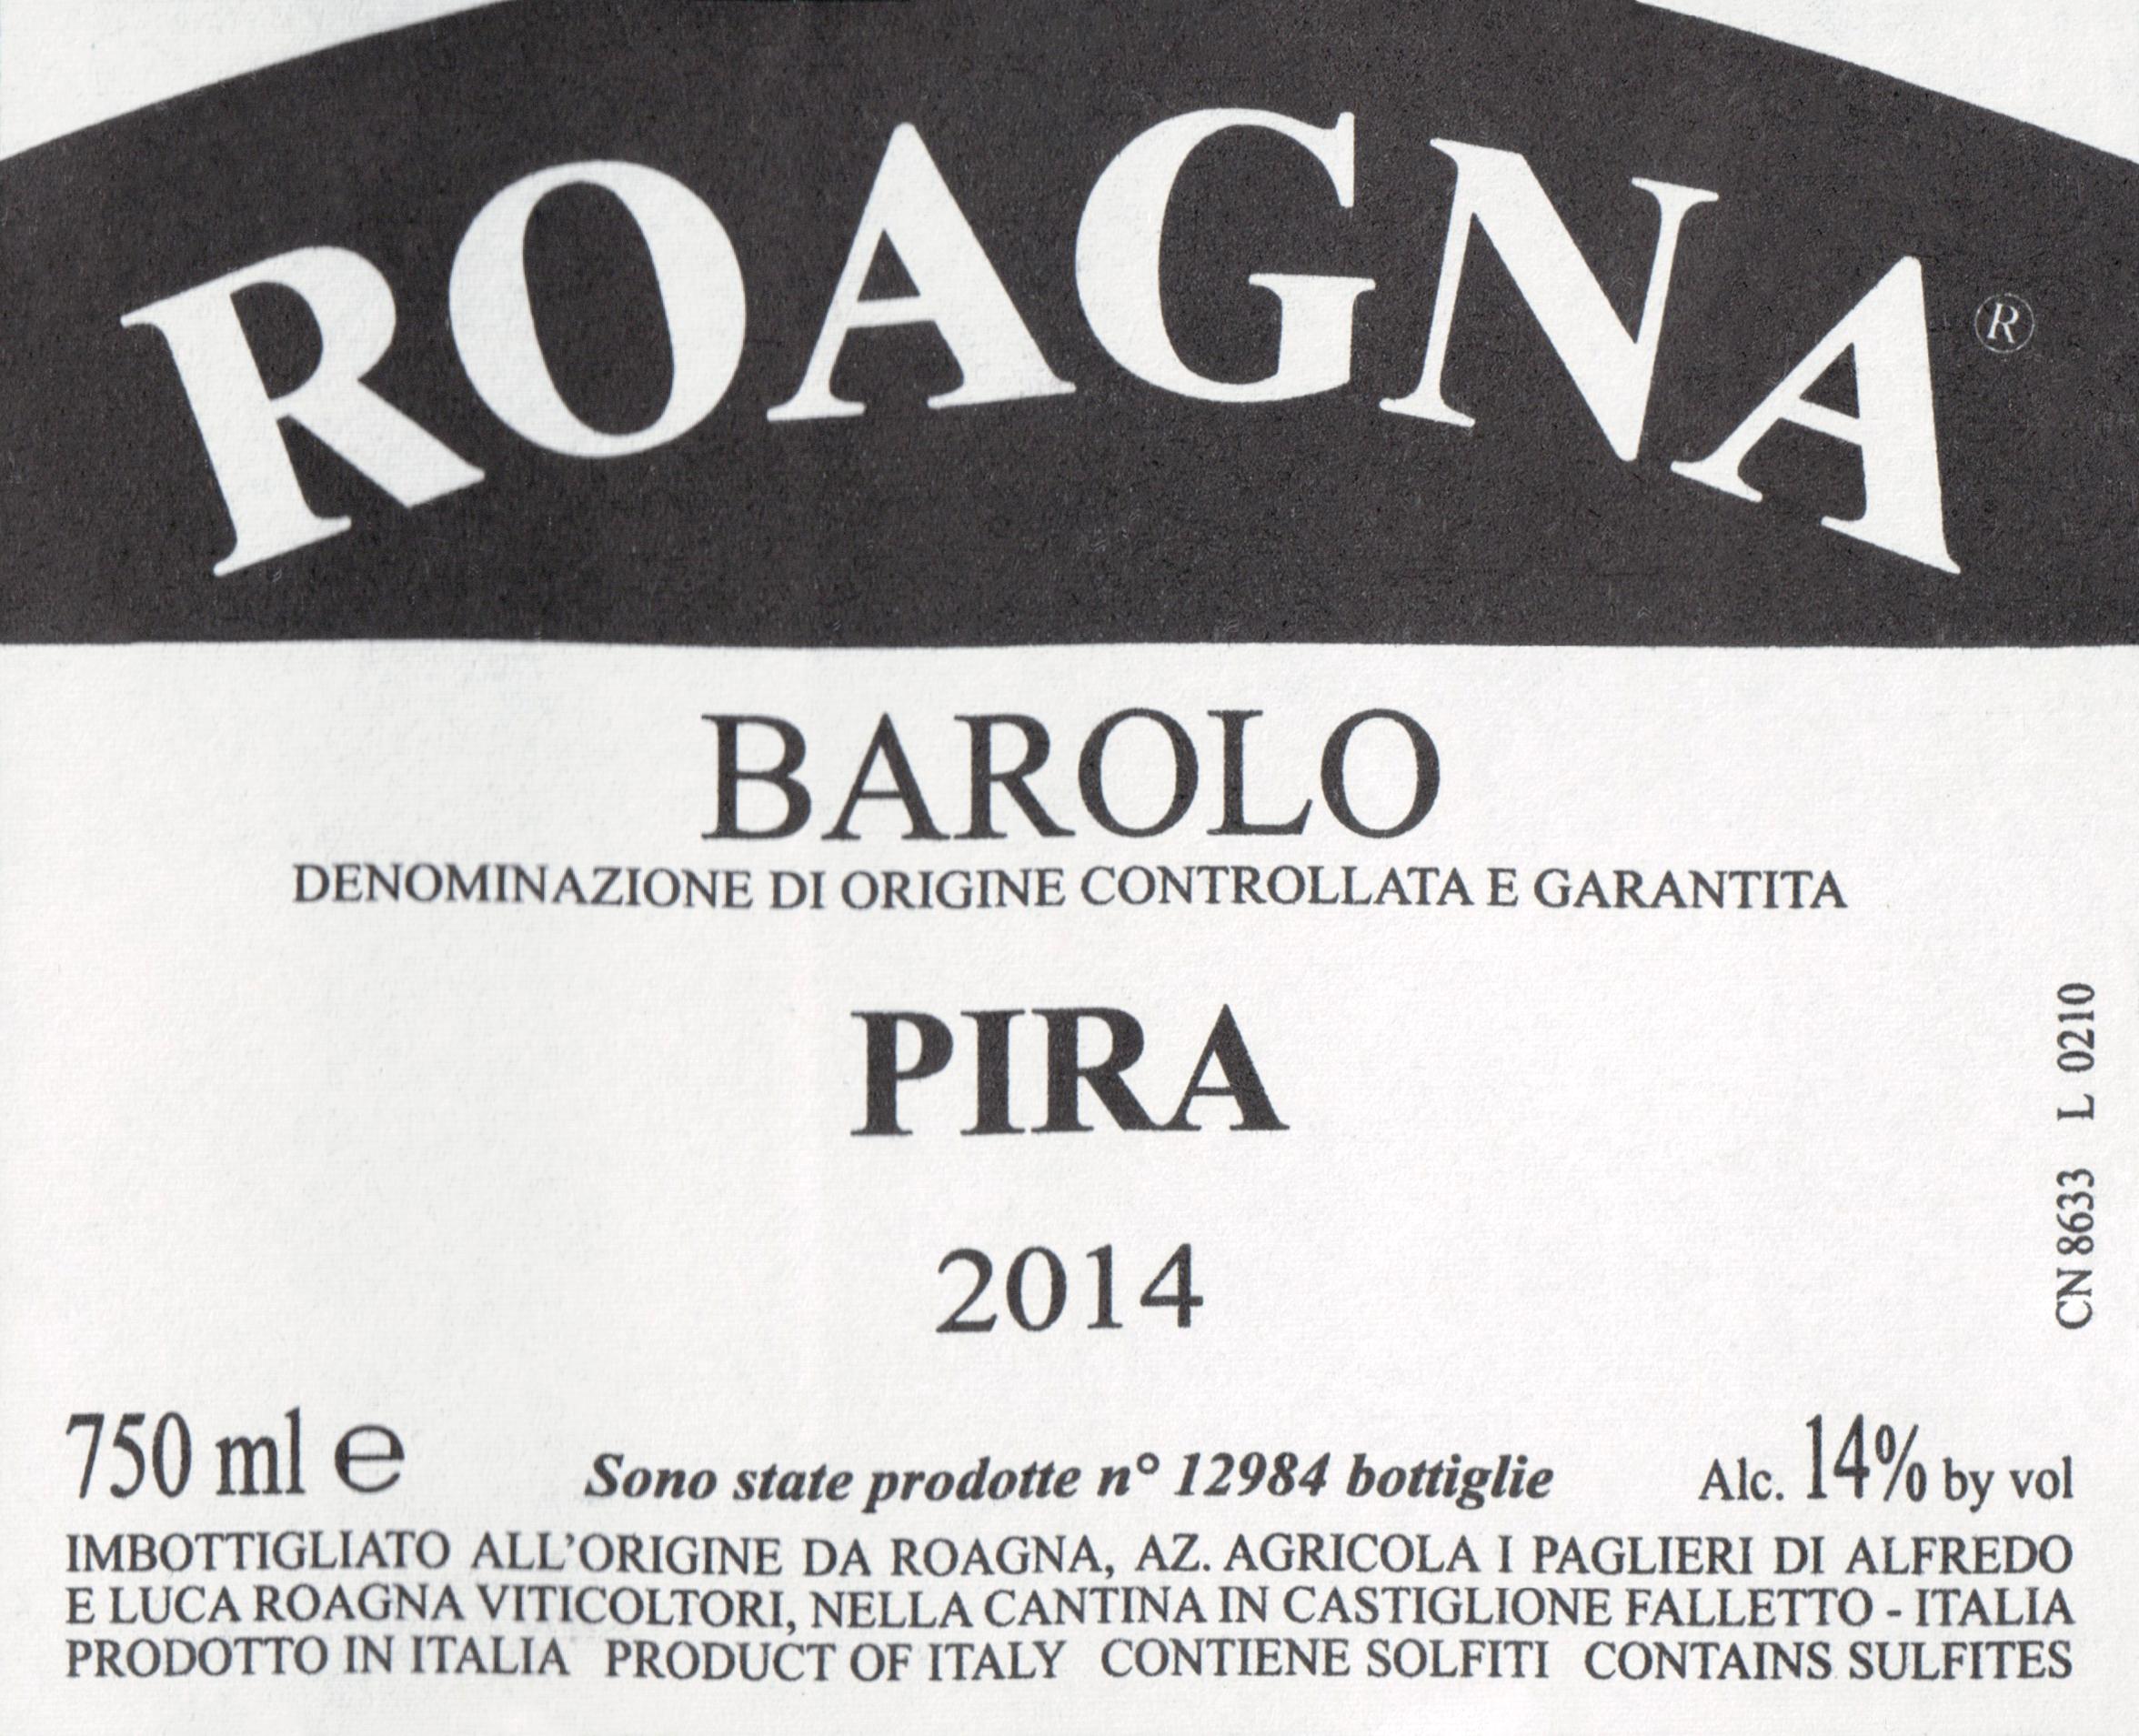 Roagna Barolo Pira 2014